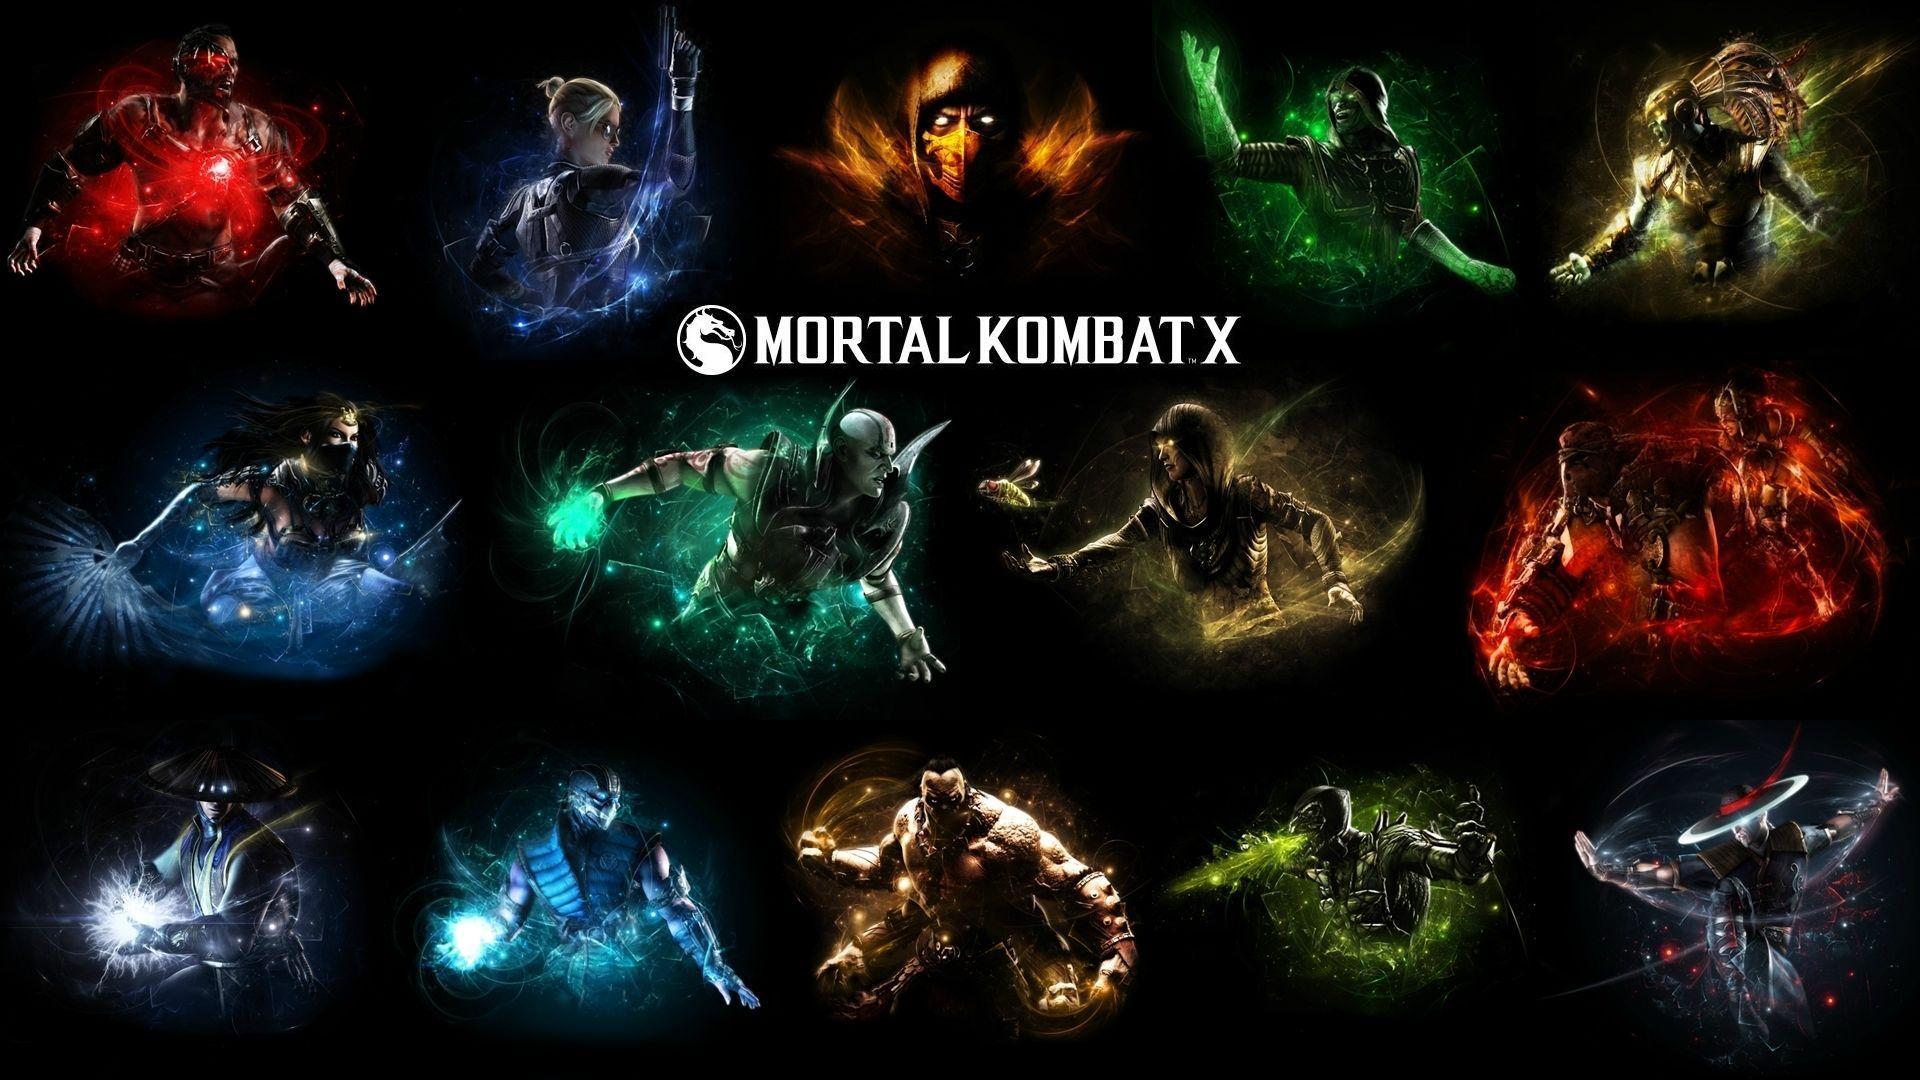 Scorpion Mortal Kombat X Wallpapers 57 Wallpapers Hd